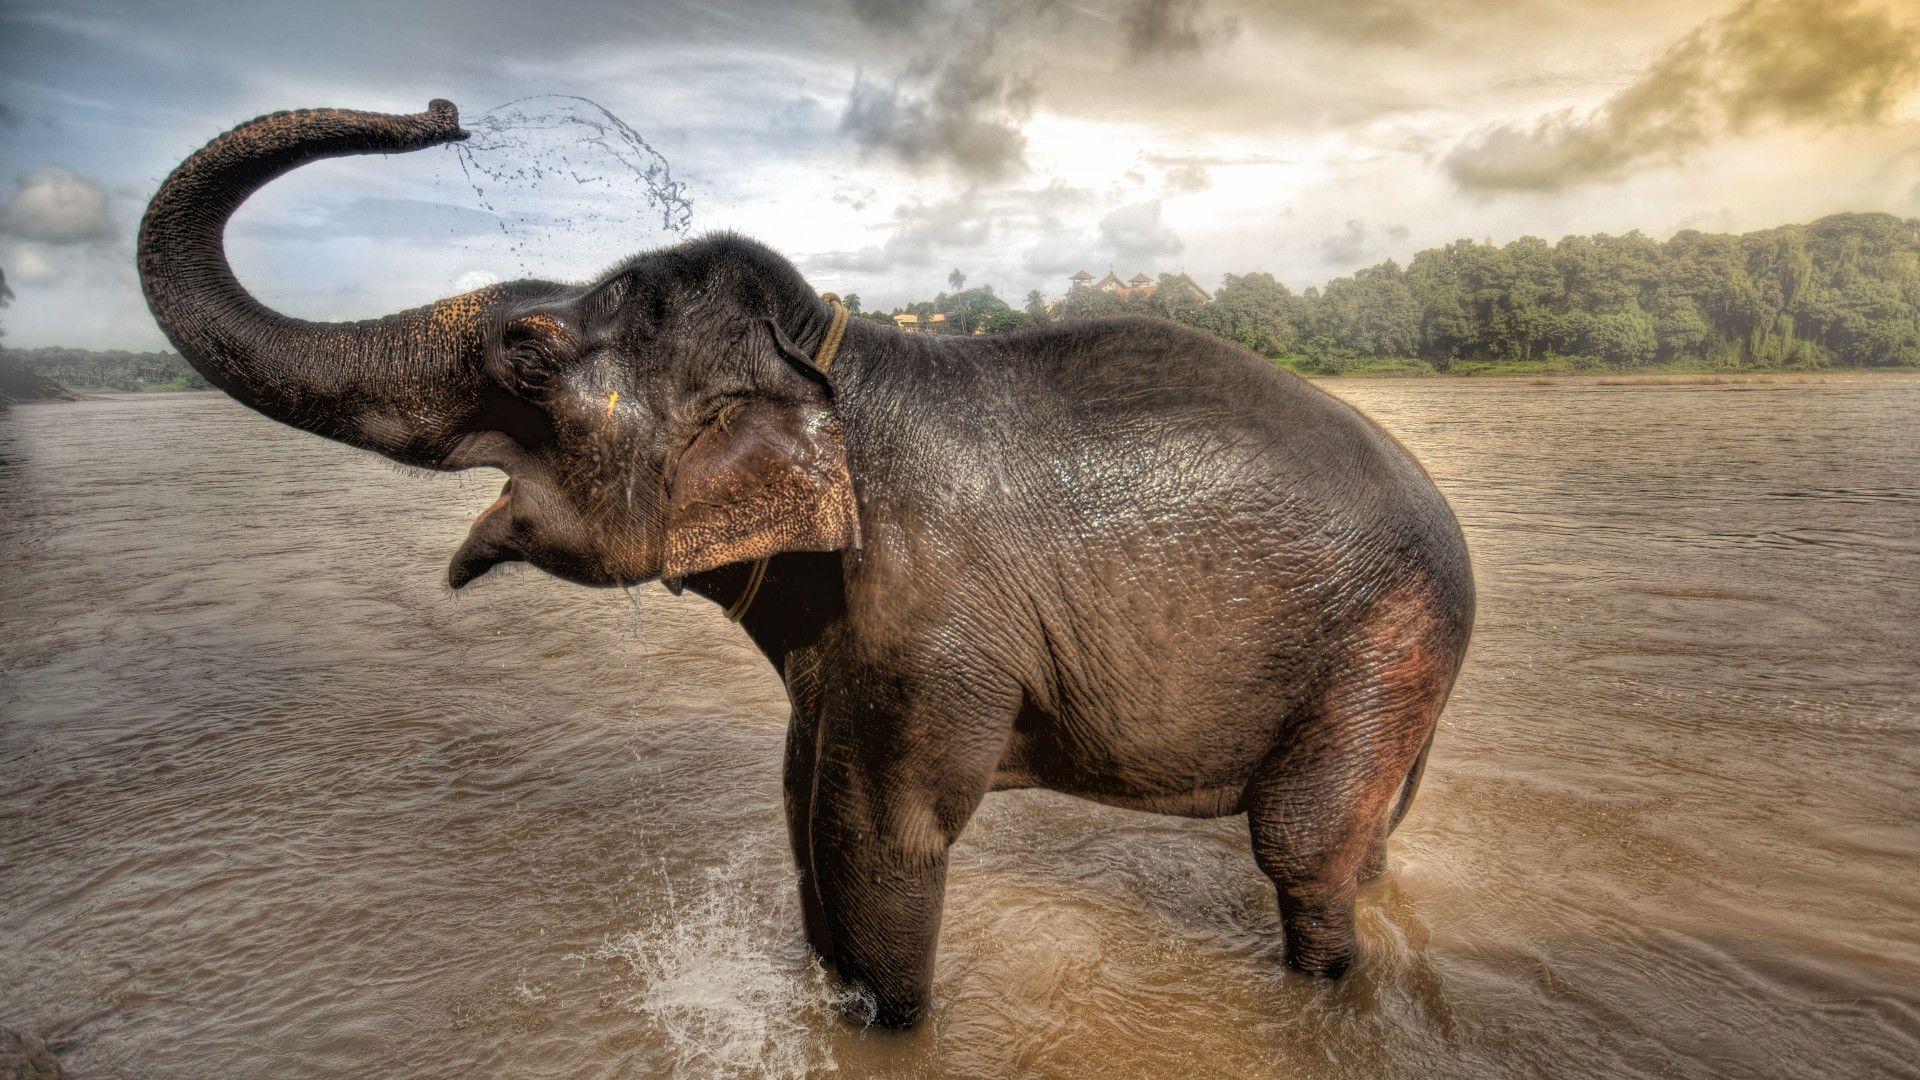 elephant wallpaper hd 1080pelephant wallpaper hd 1080p, 1920 x